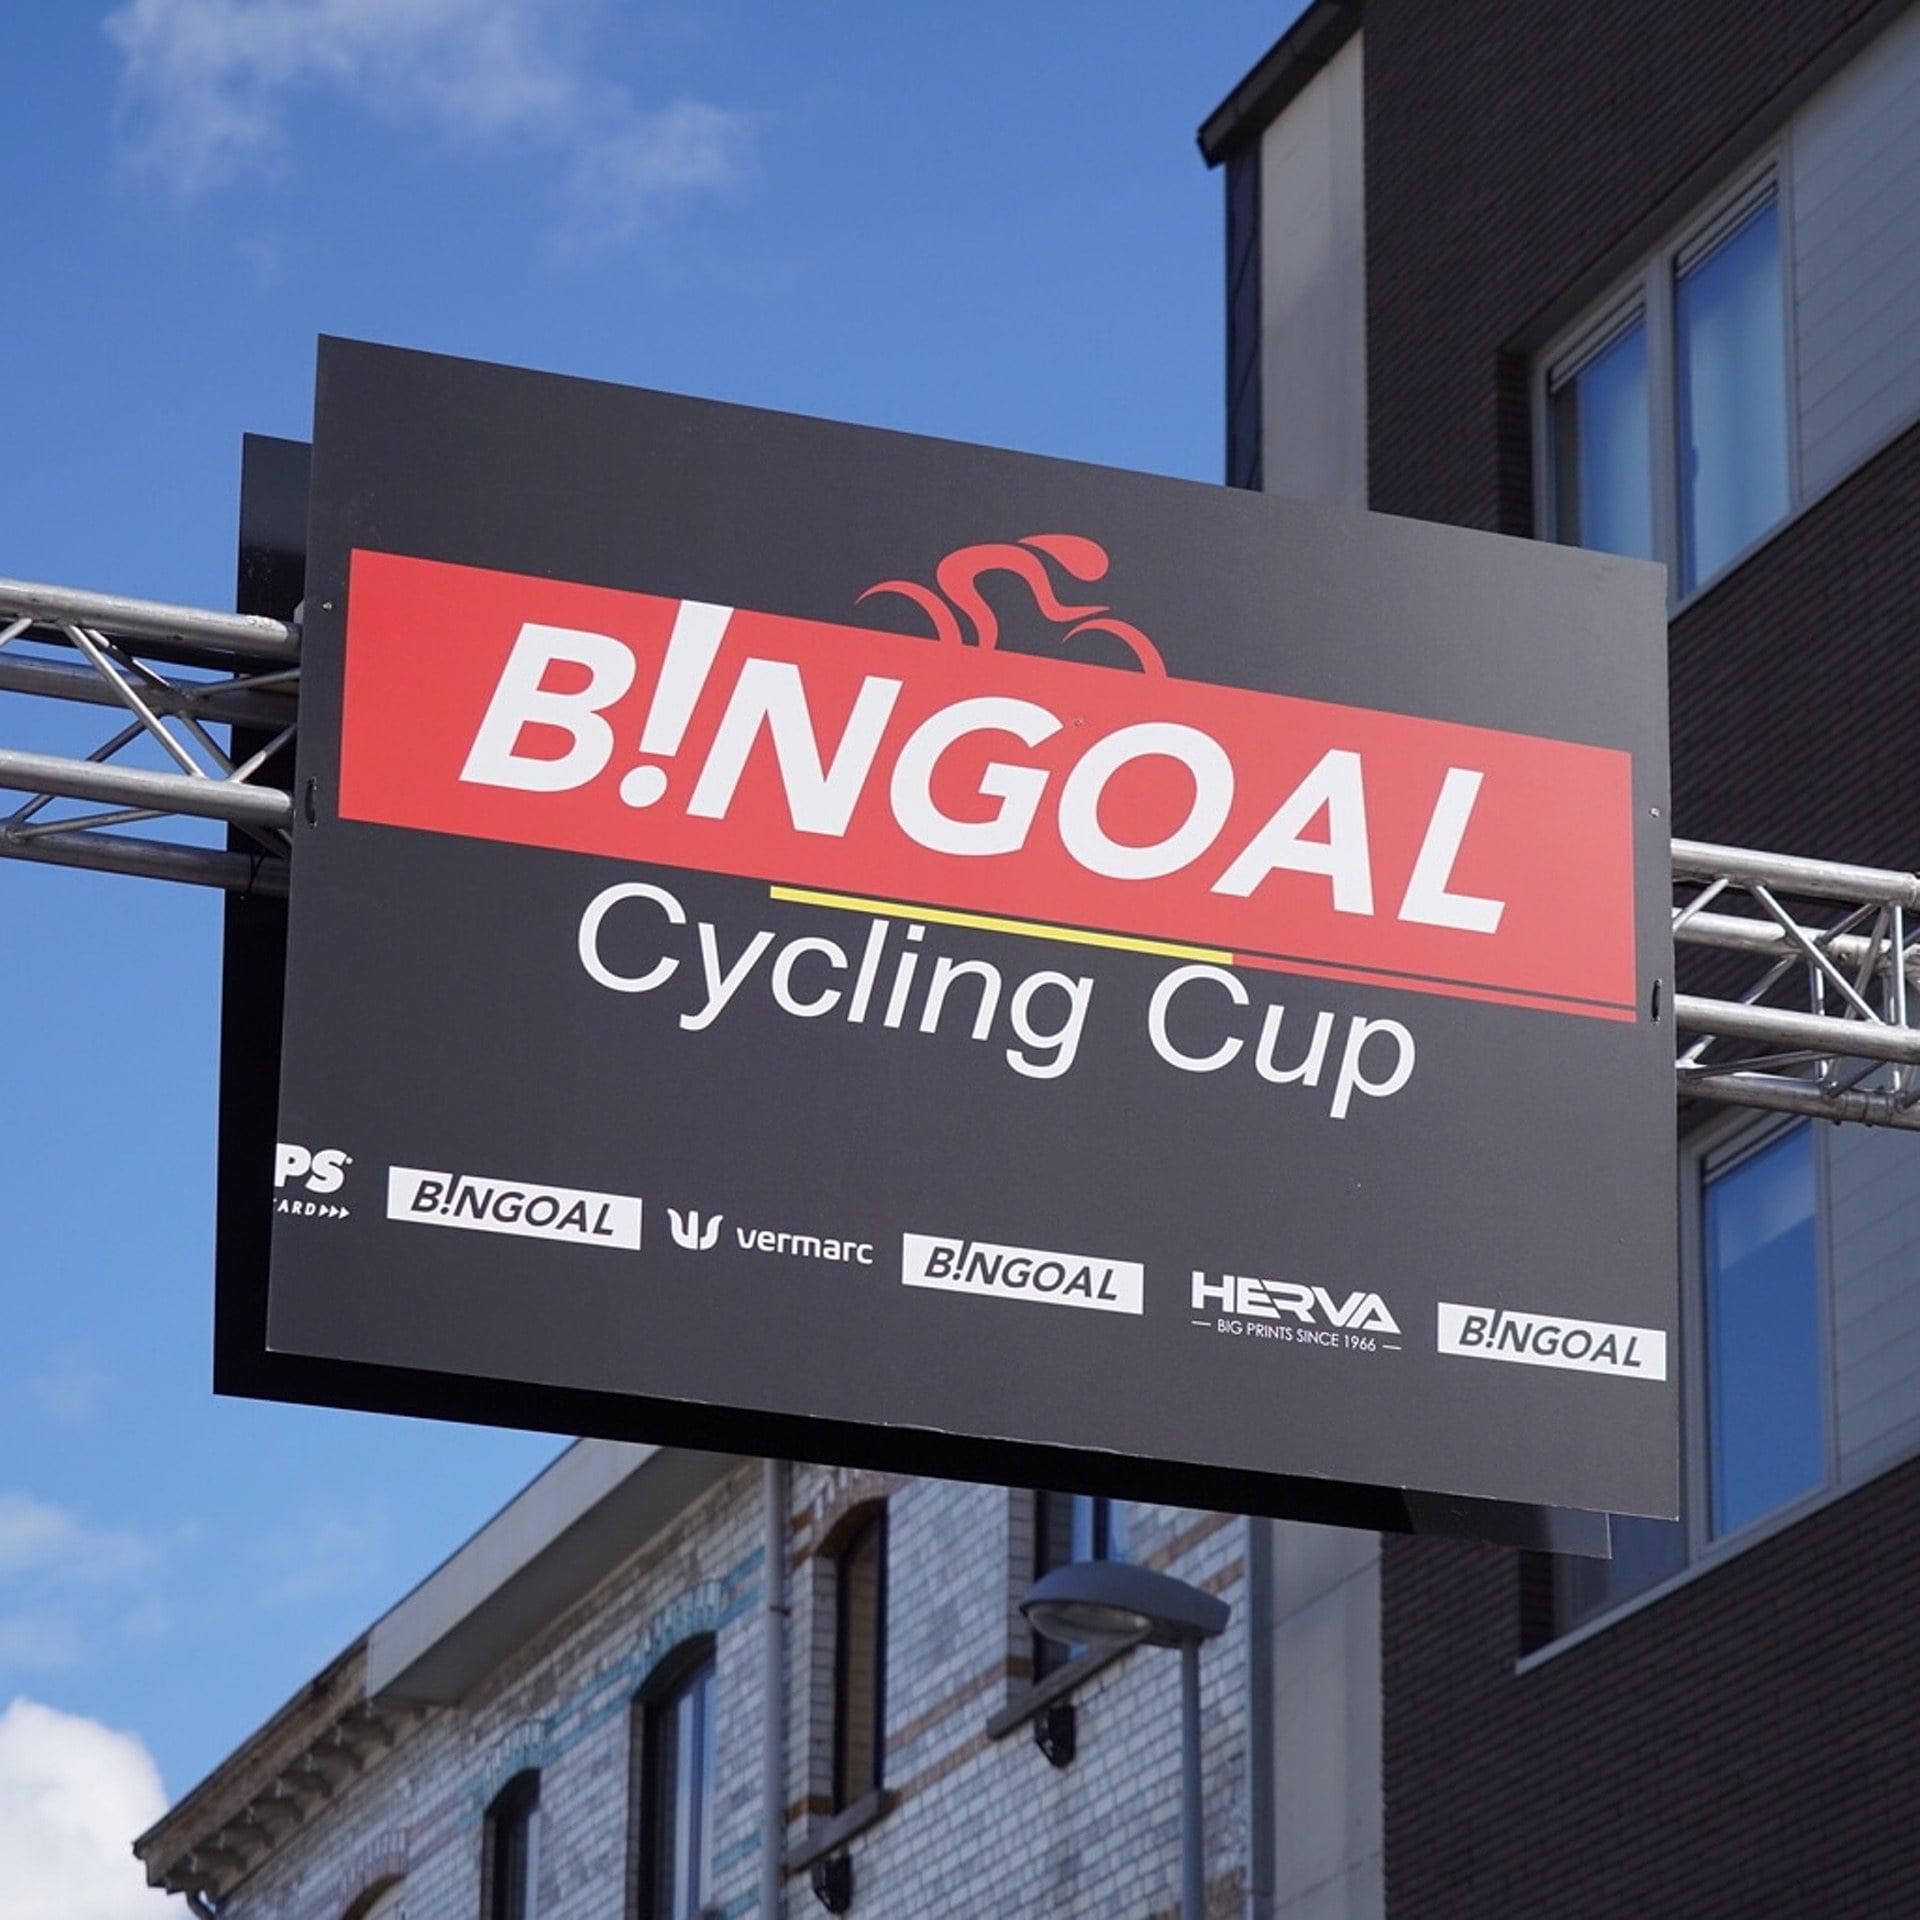 GP Jean-Pierre Monseré afgelast om veiligheidsredenen - Bingoal Cyling Cup